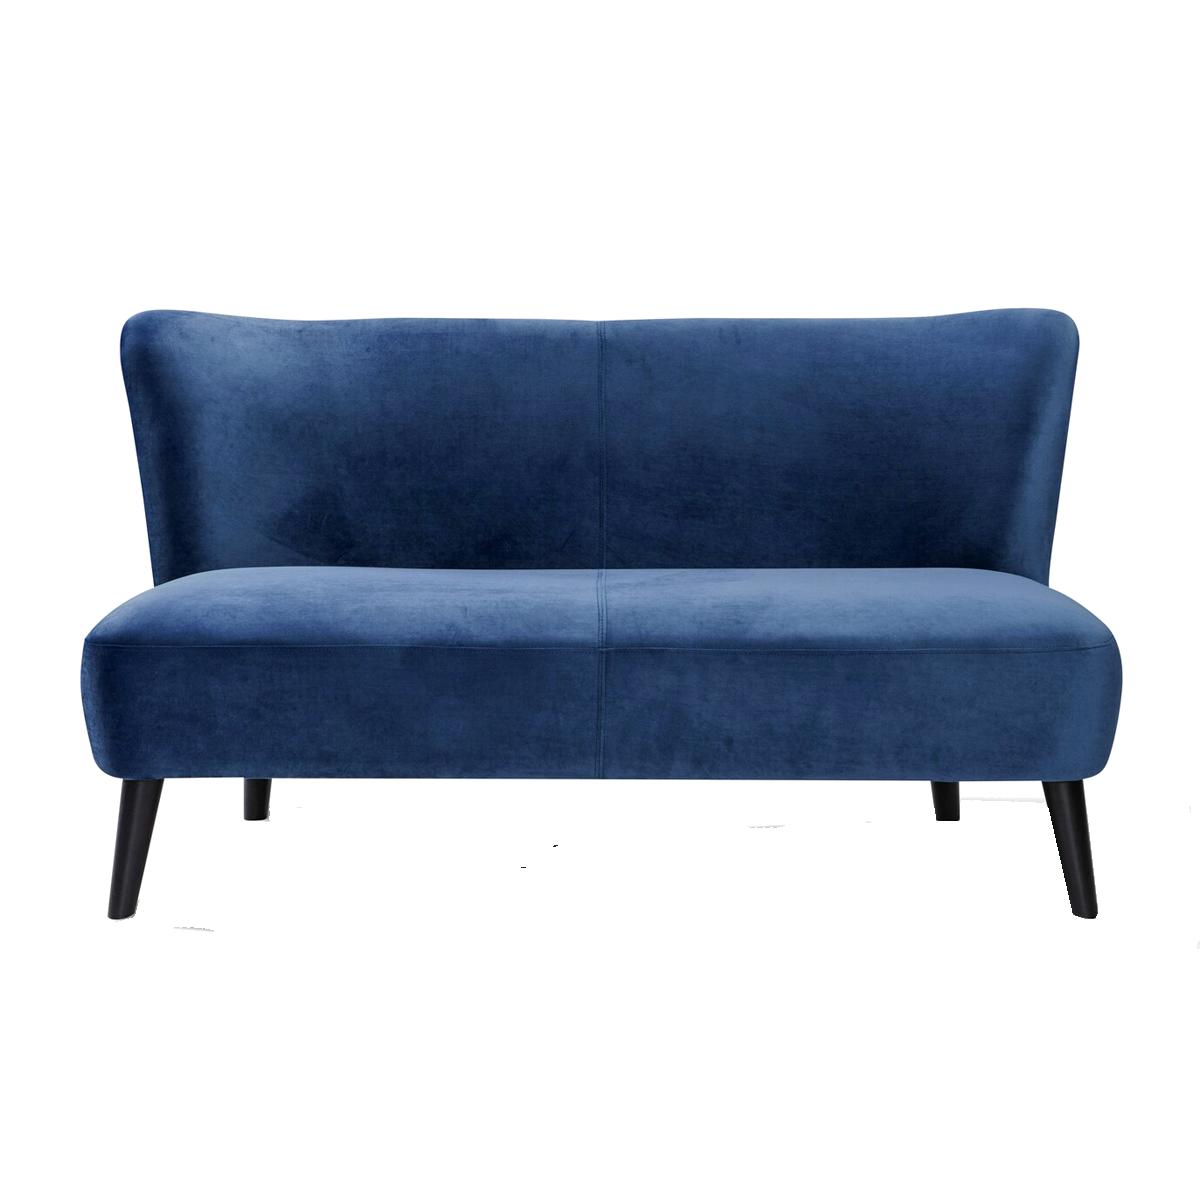 Full Size of Sofa Blau Sit Mbel Sit4sofa 2 Sitzer Mit Samtbezug Holzbeine Schwarz Minotti Modulares Benz Leder Schlaffunktion Wk Zweisitzer Langes Indomo Le Corbusier Big Sofa Sofa Blau